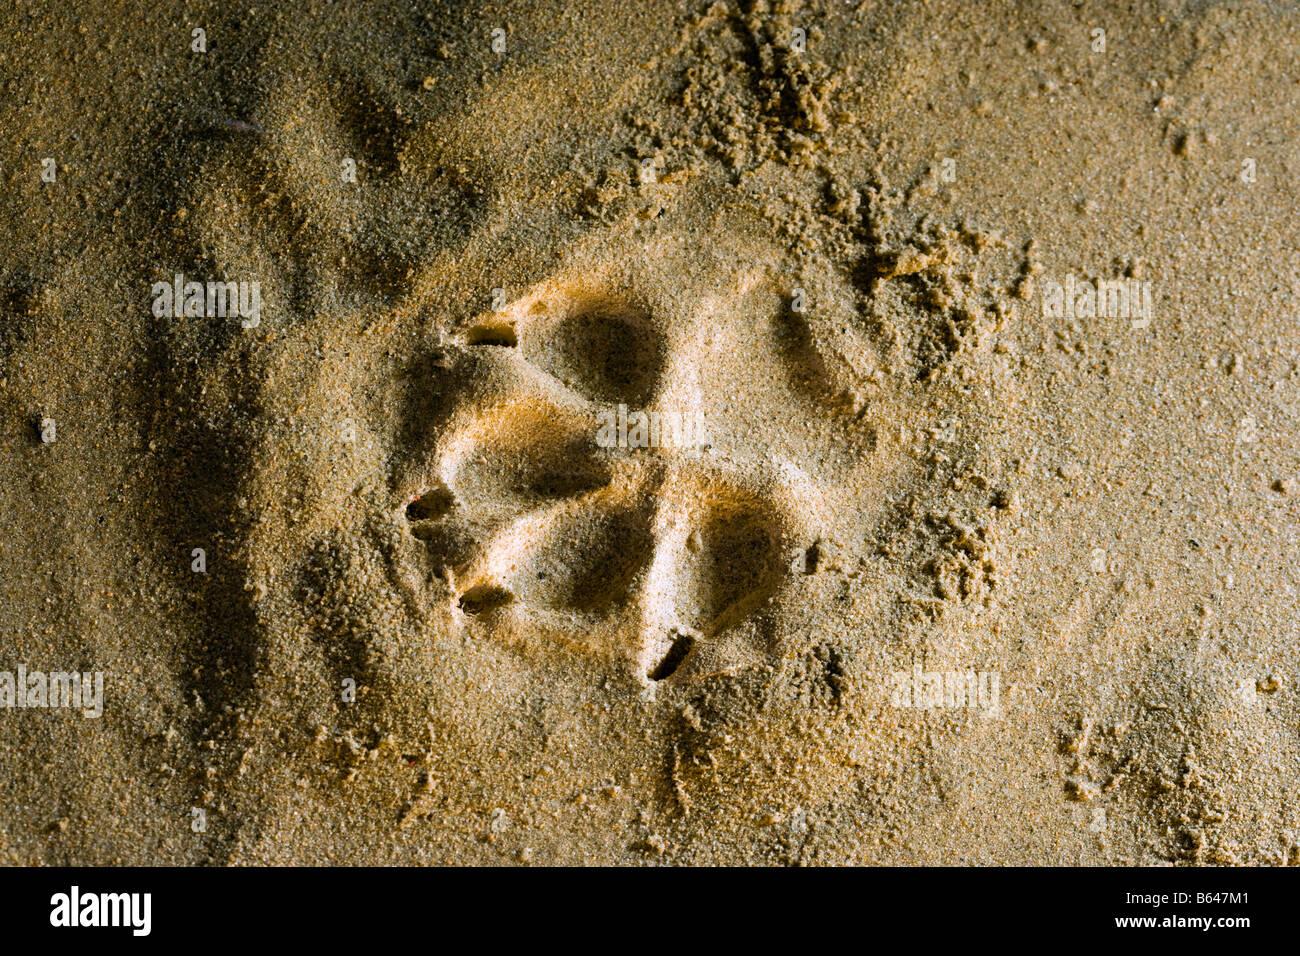 La Finlande, Kuhmo, Petola Centre d'accueil. Informations sur la plus grande des carnivores et preditors. Empreinte Photo Stock